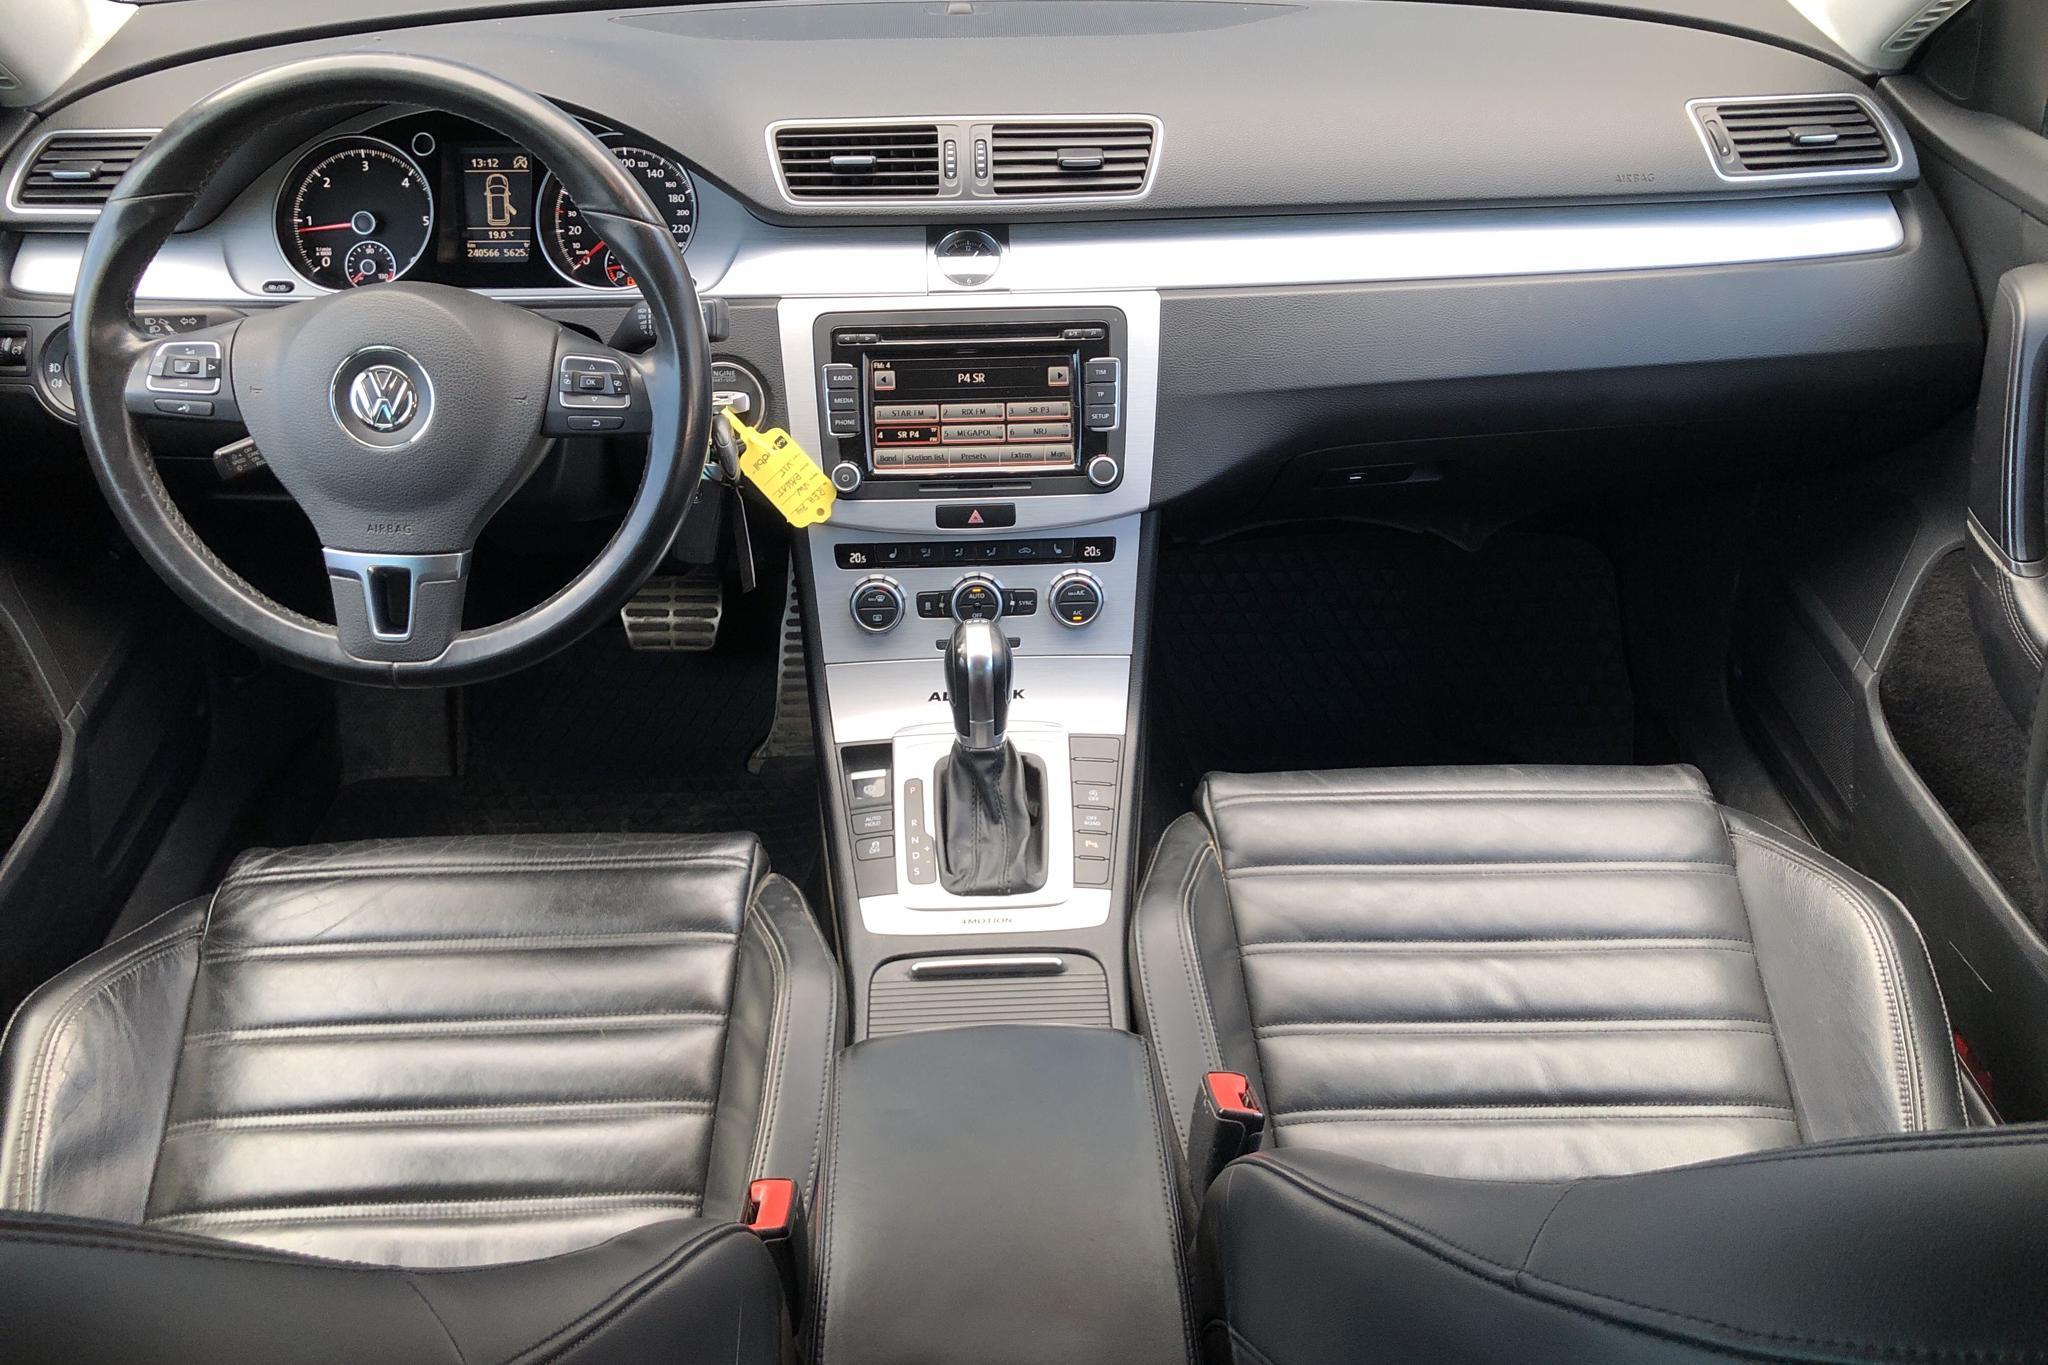 VW Passat Alltrack 2.0 TDI BlueMotion Technology 4Motion (177hk) - 240 570 km - Automatic - white - 2014